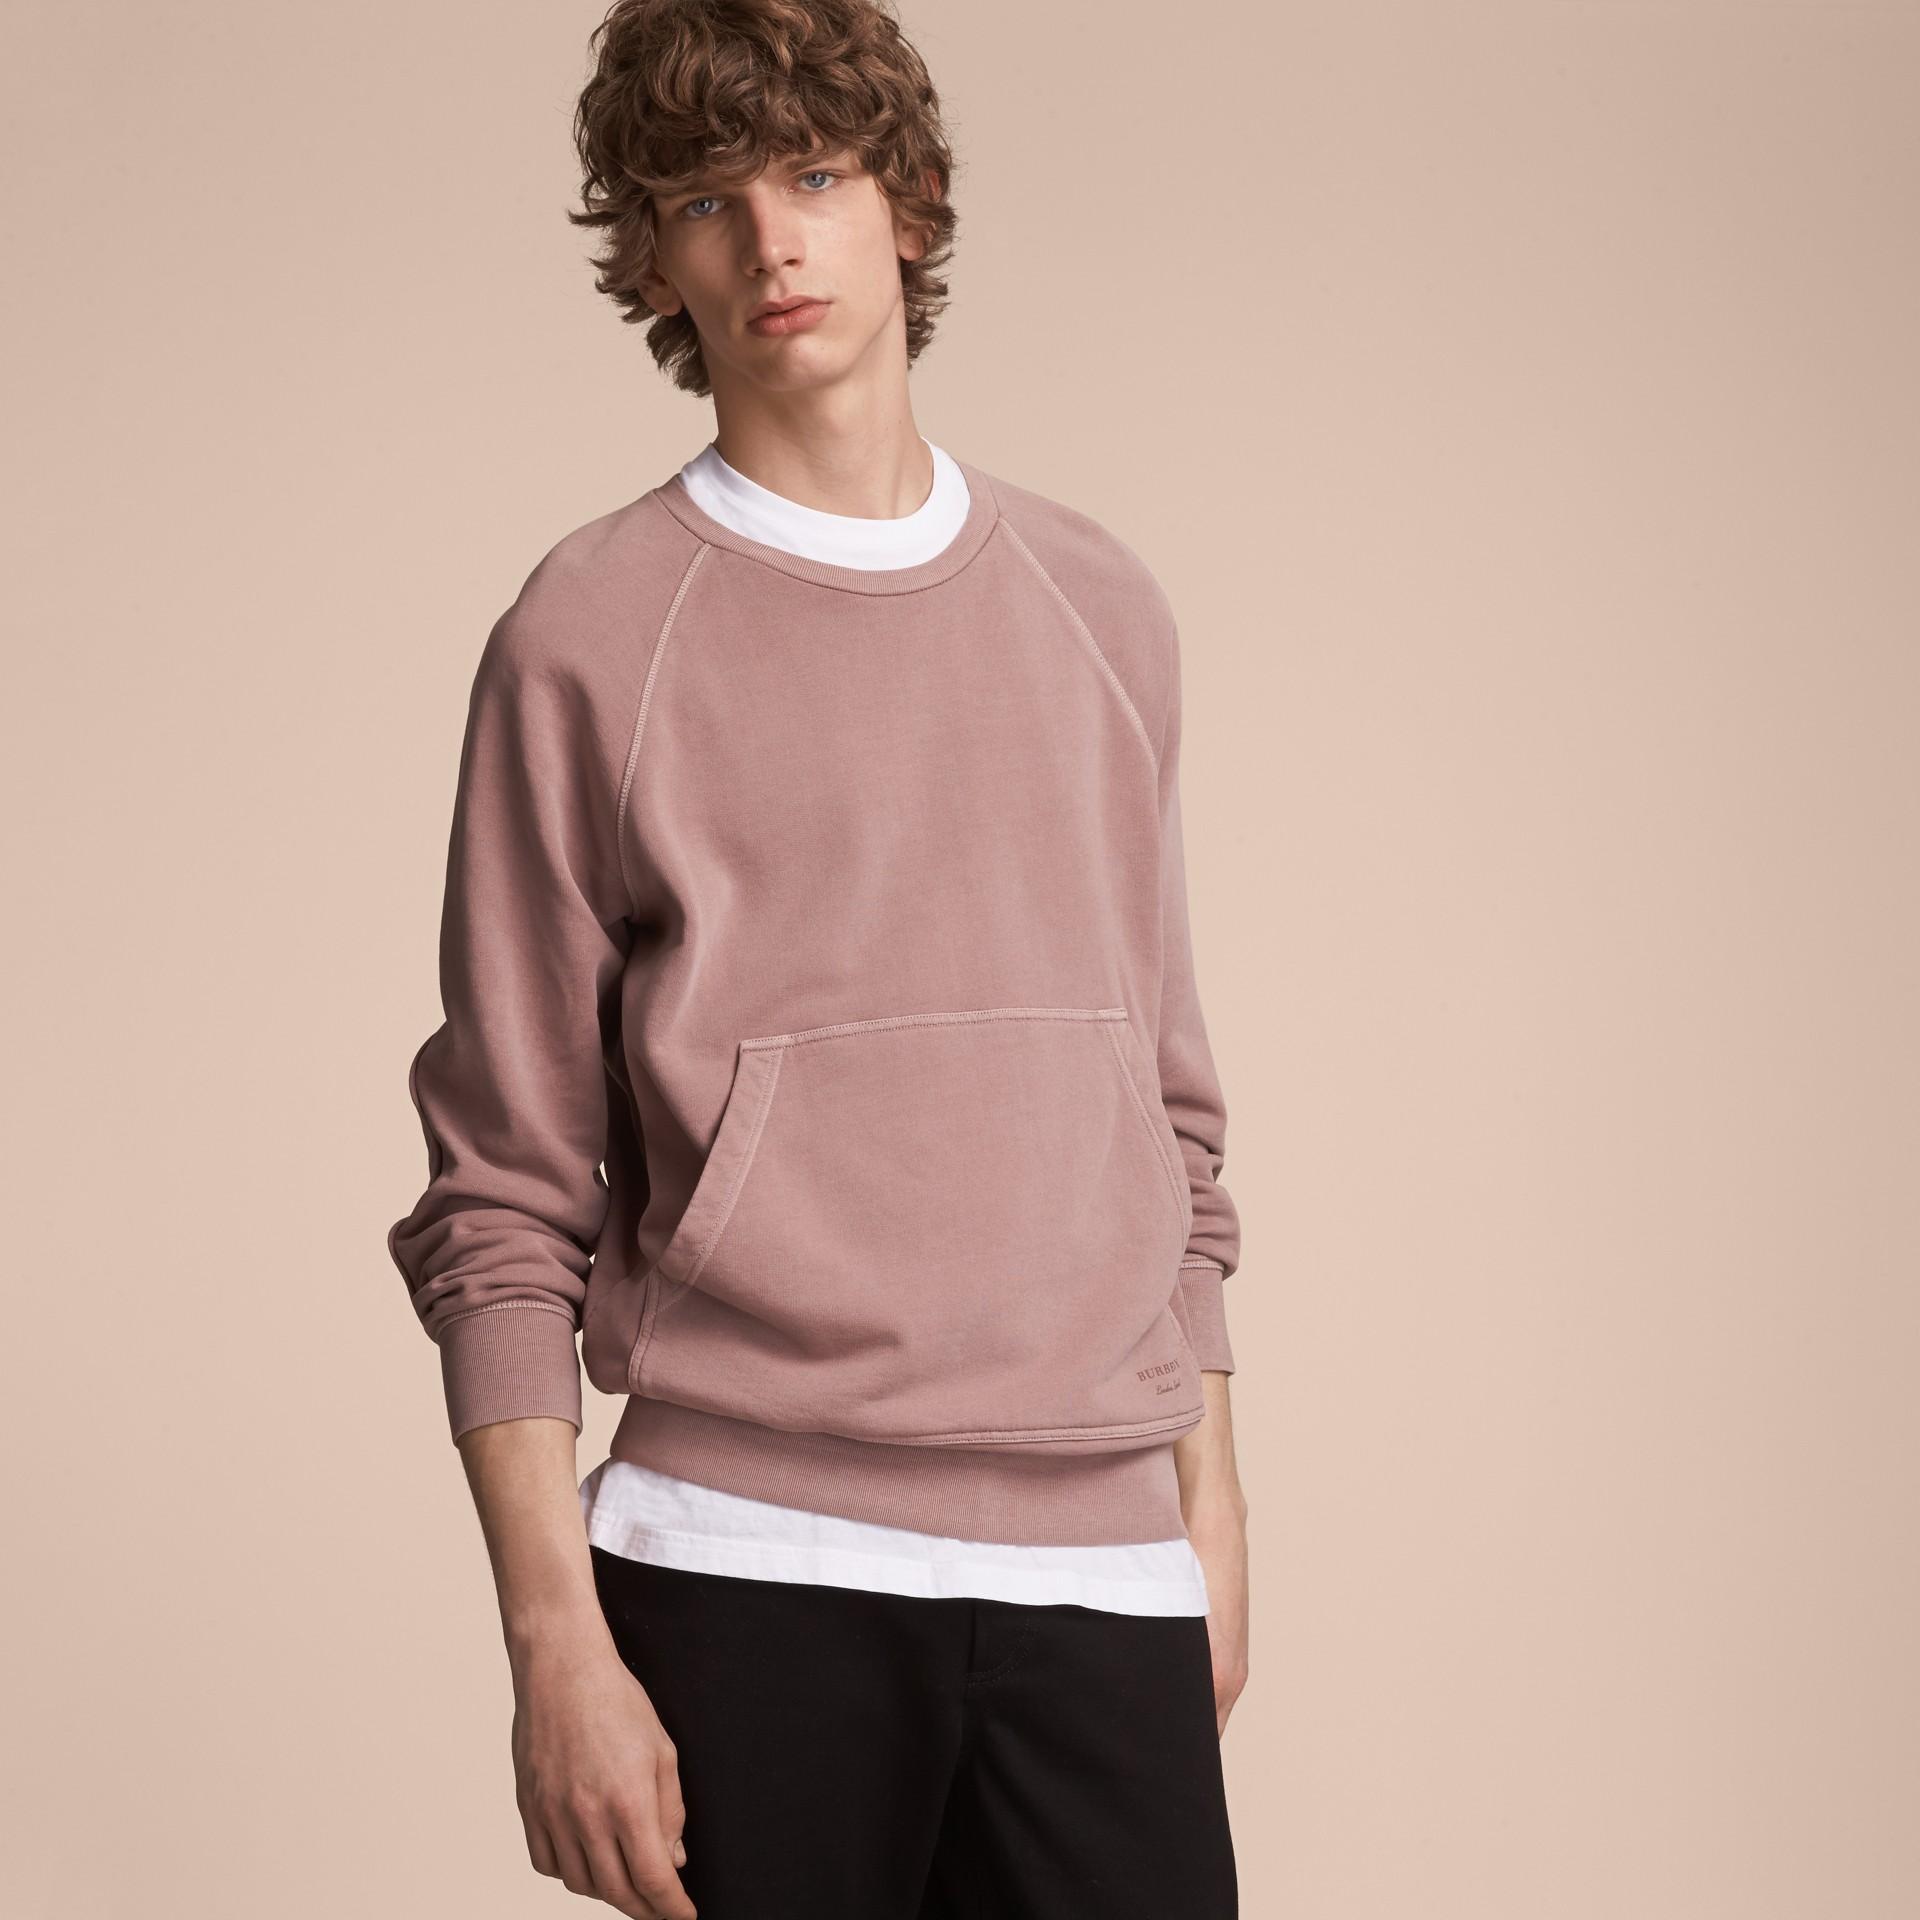 Unisex Pigment-dyed Cotton Oversize Sweatshirt Dusty Mauve - gallery image 6